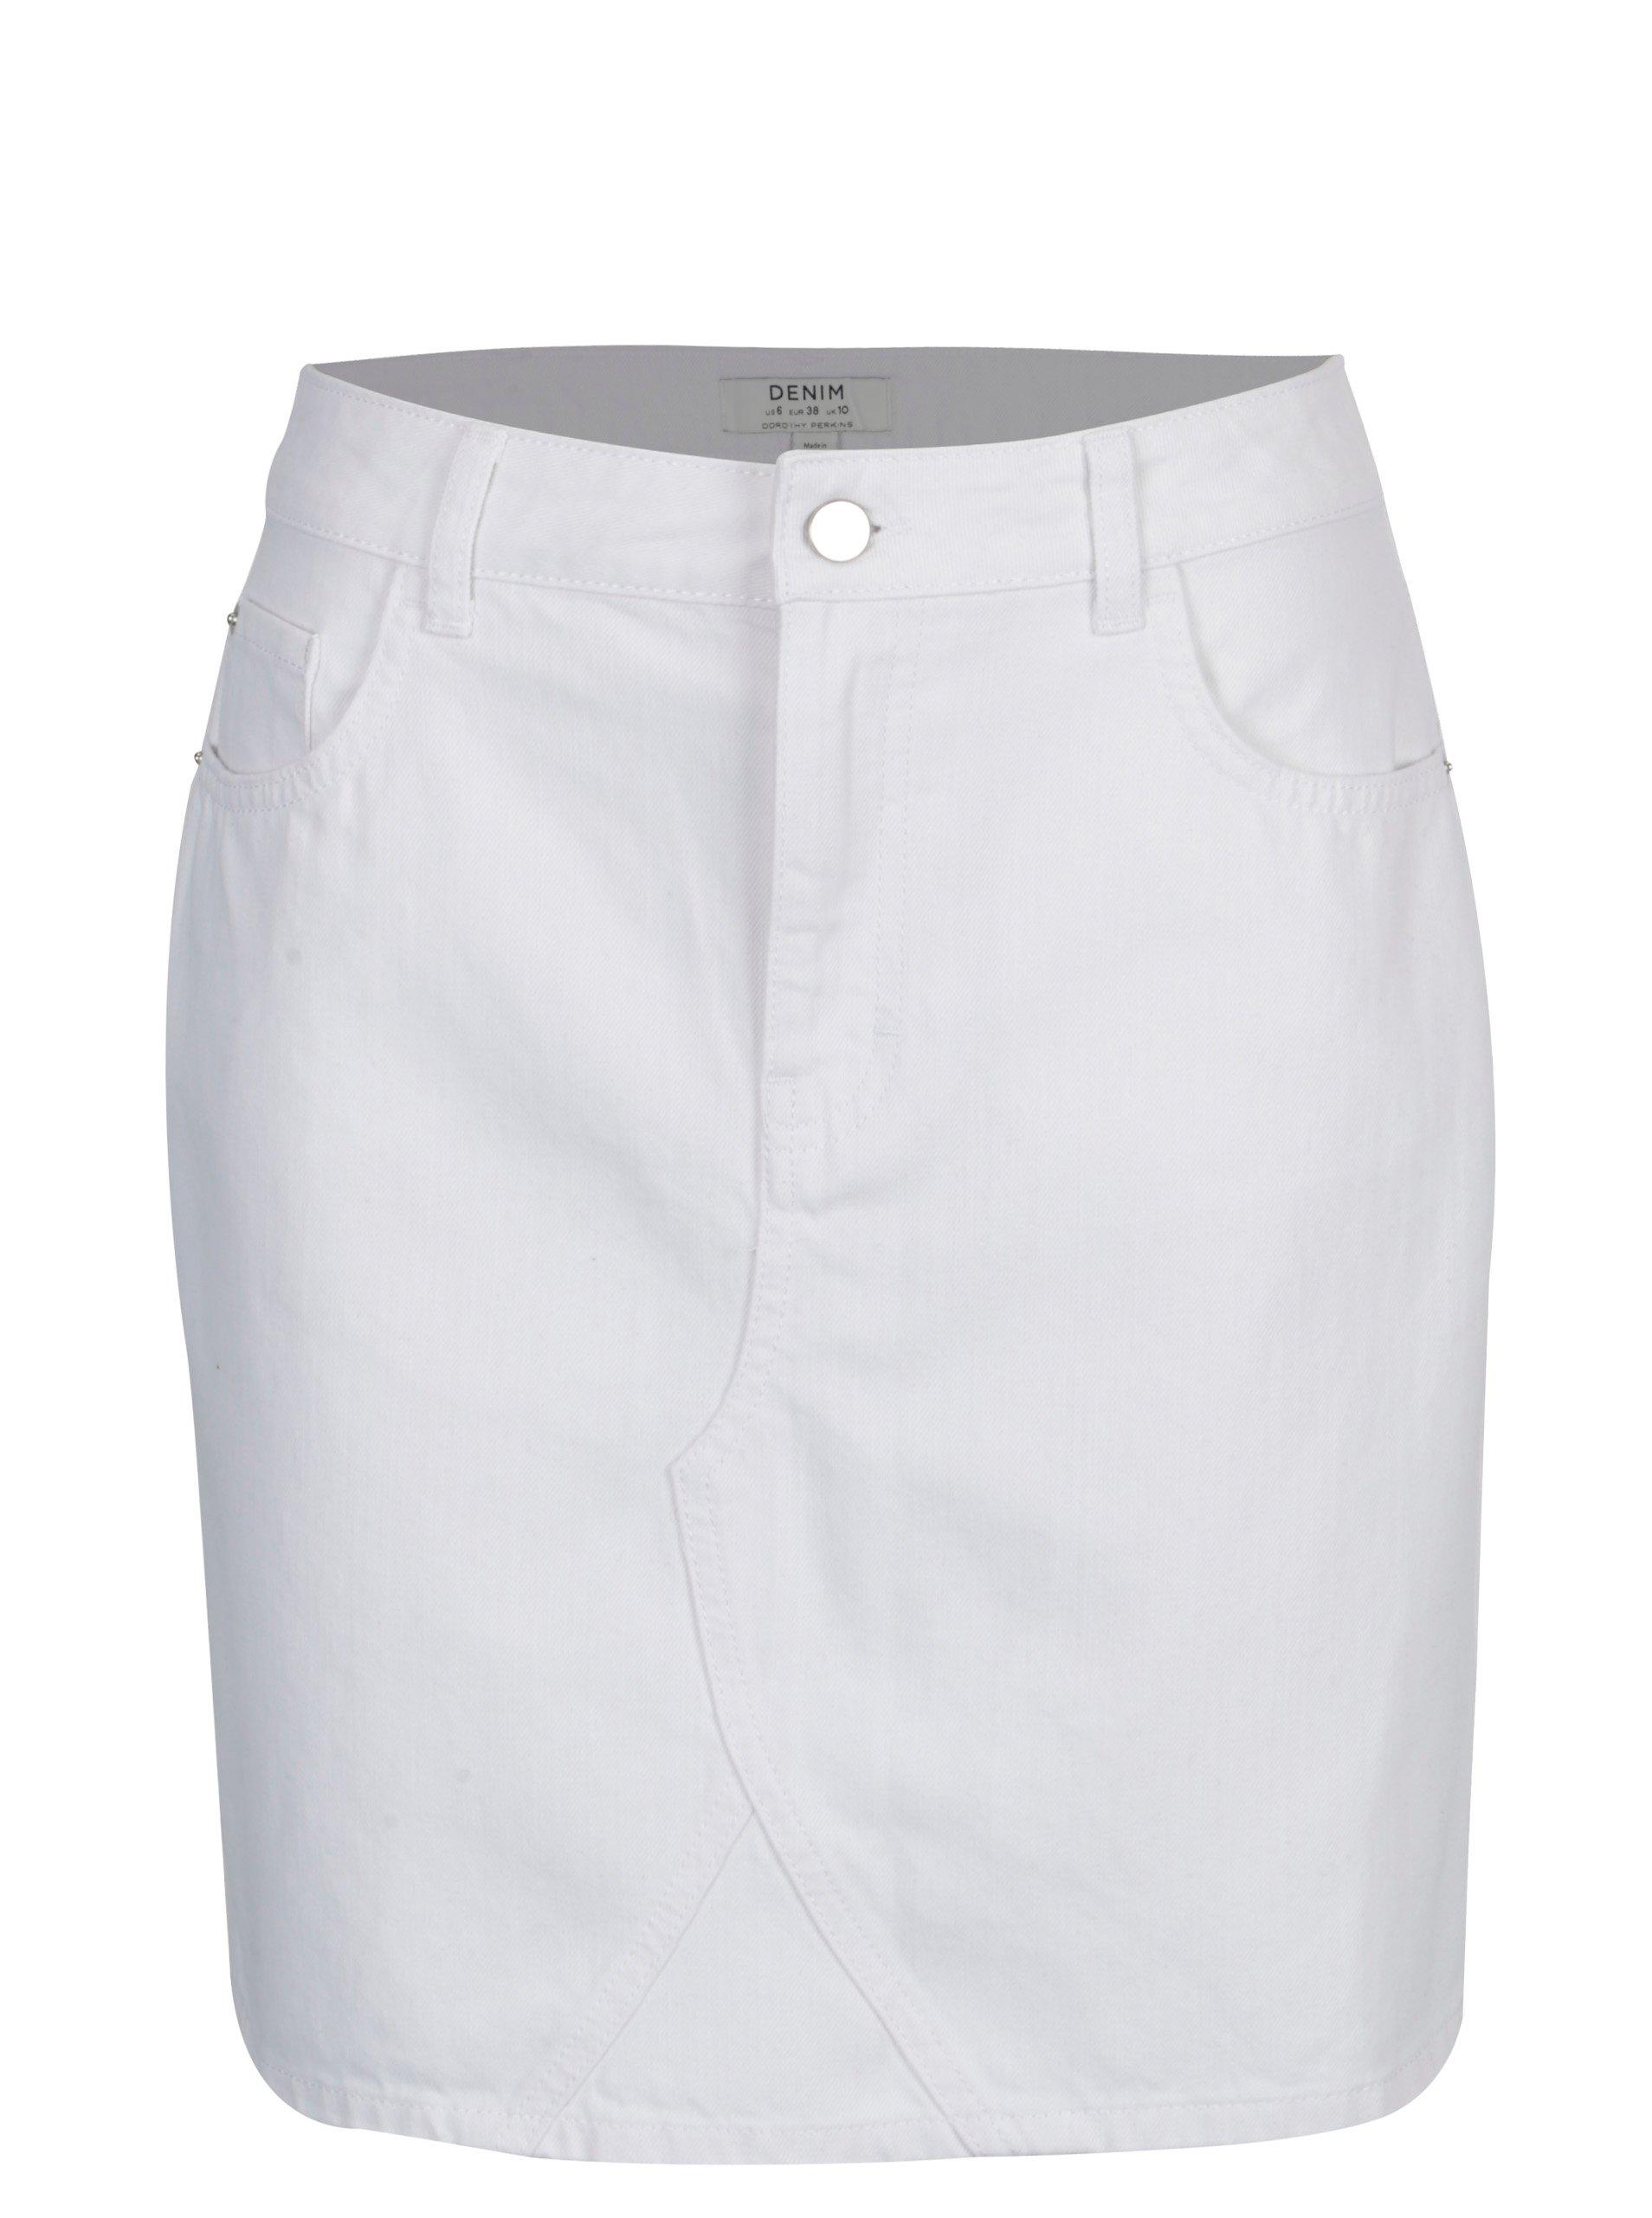 0a48f99defe9 Biela rifľová sukňa Dorothy Perkins